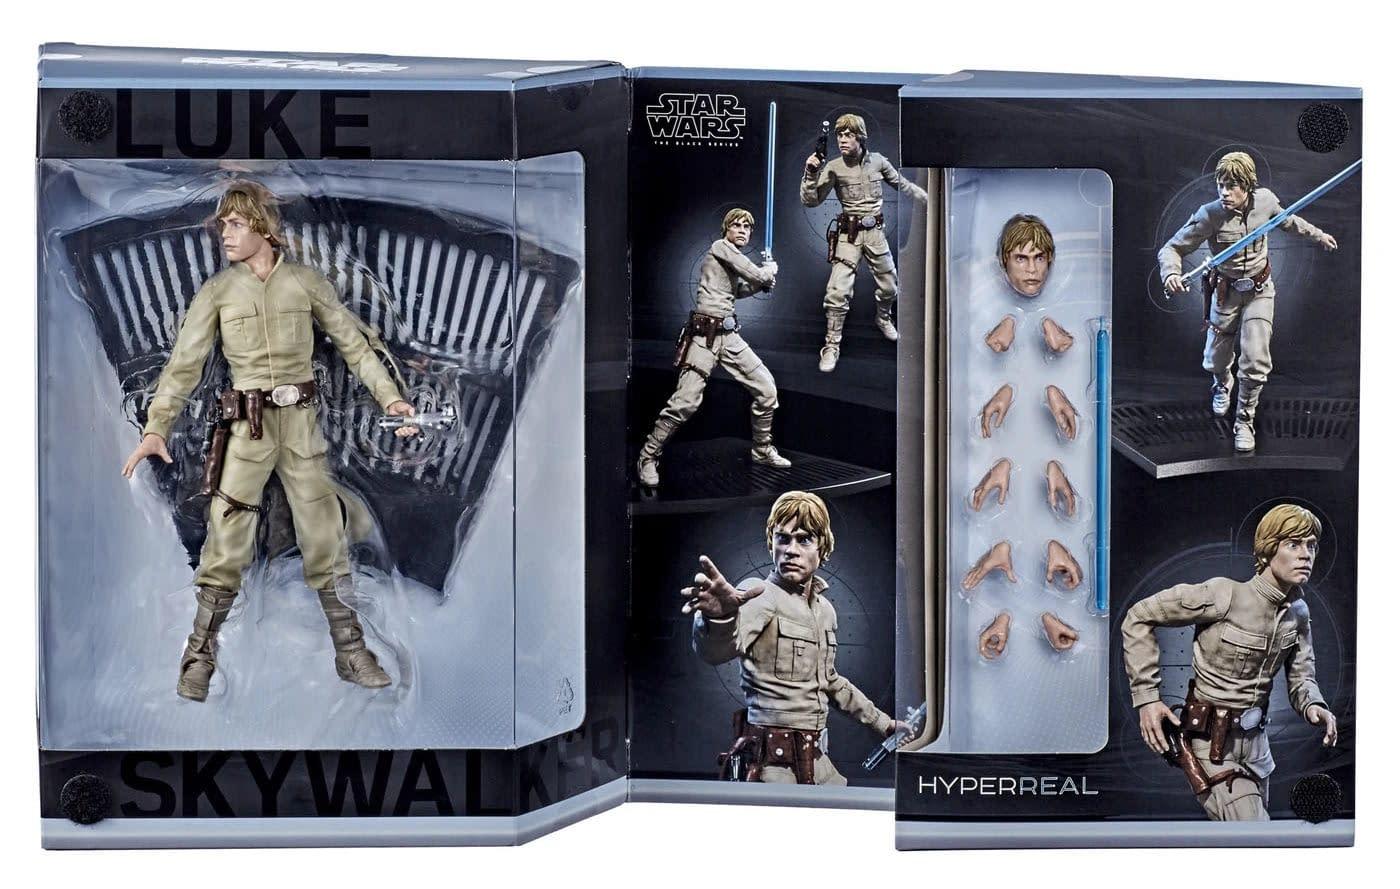 Star Wars The Black Series HyperReal Luke Skywalker from Hasbro